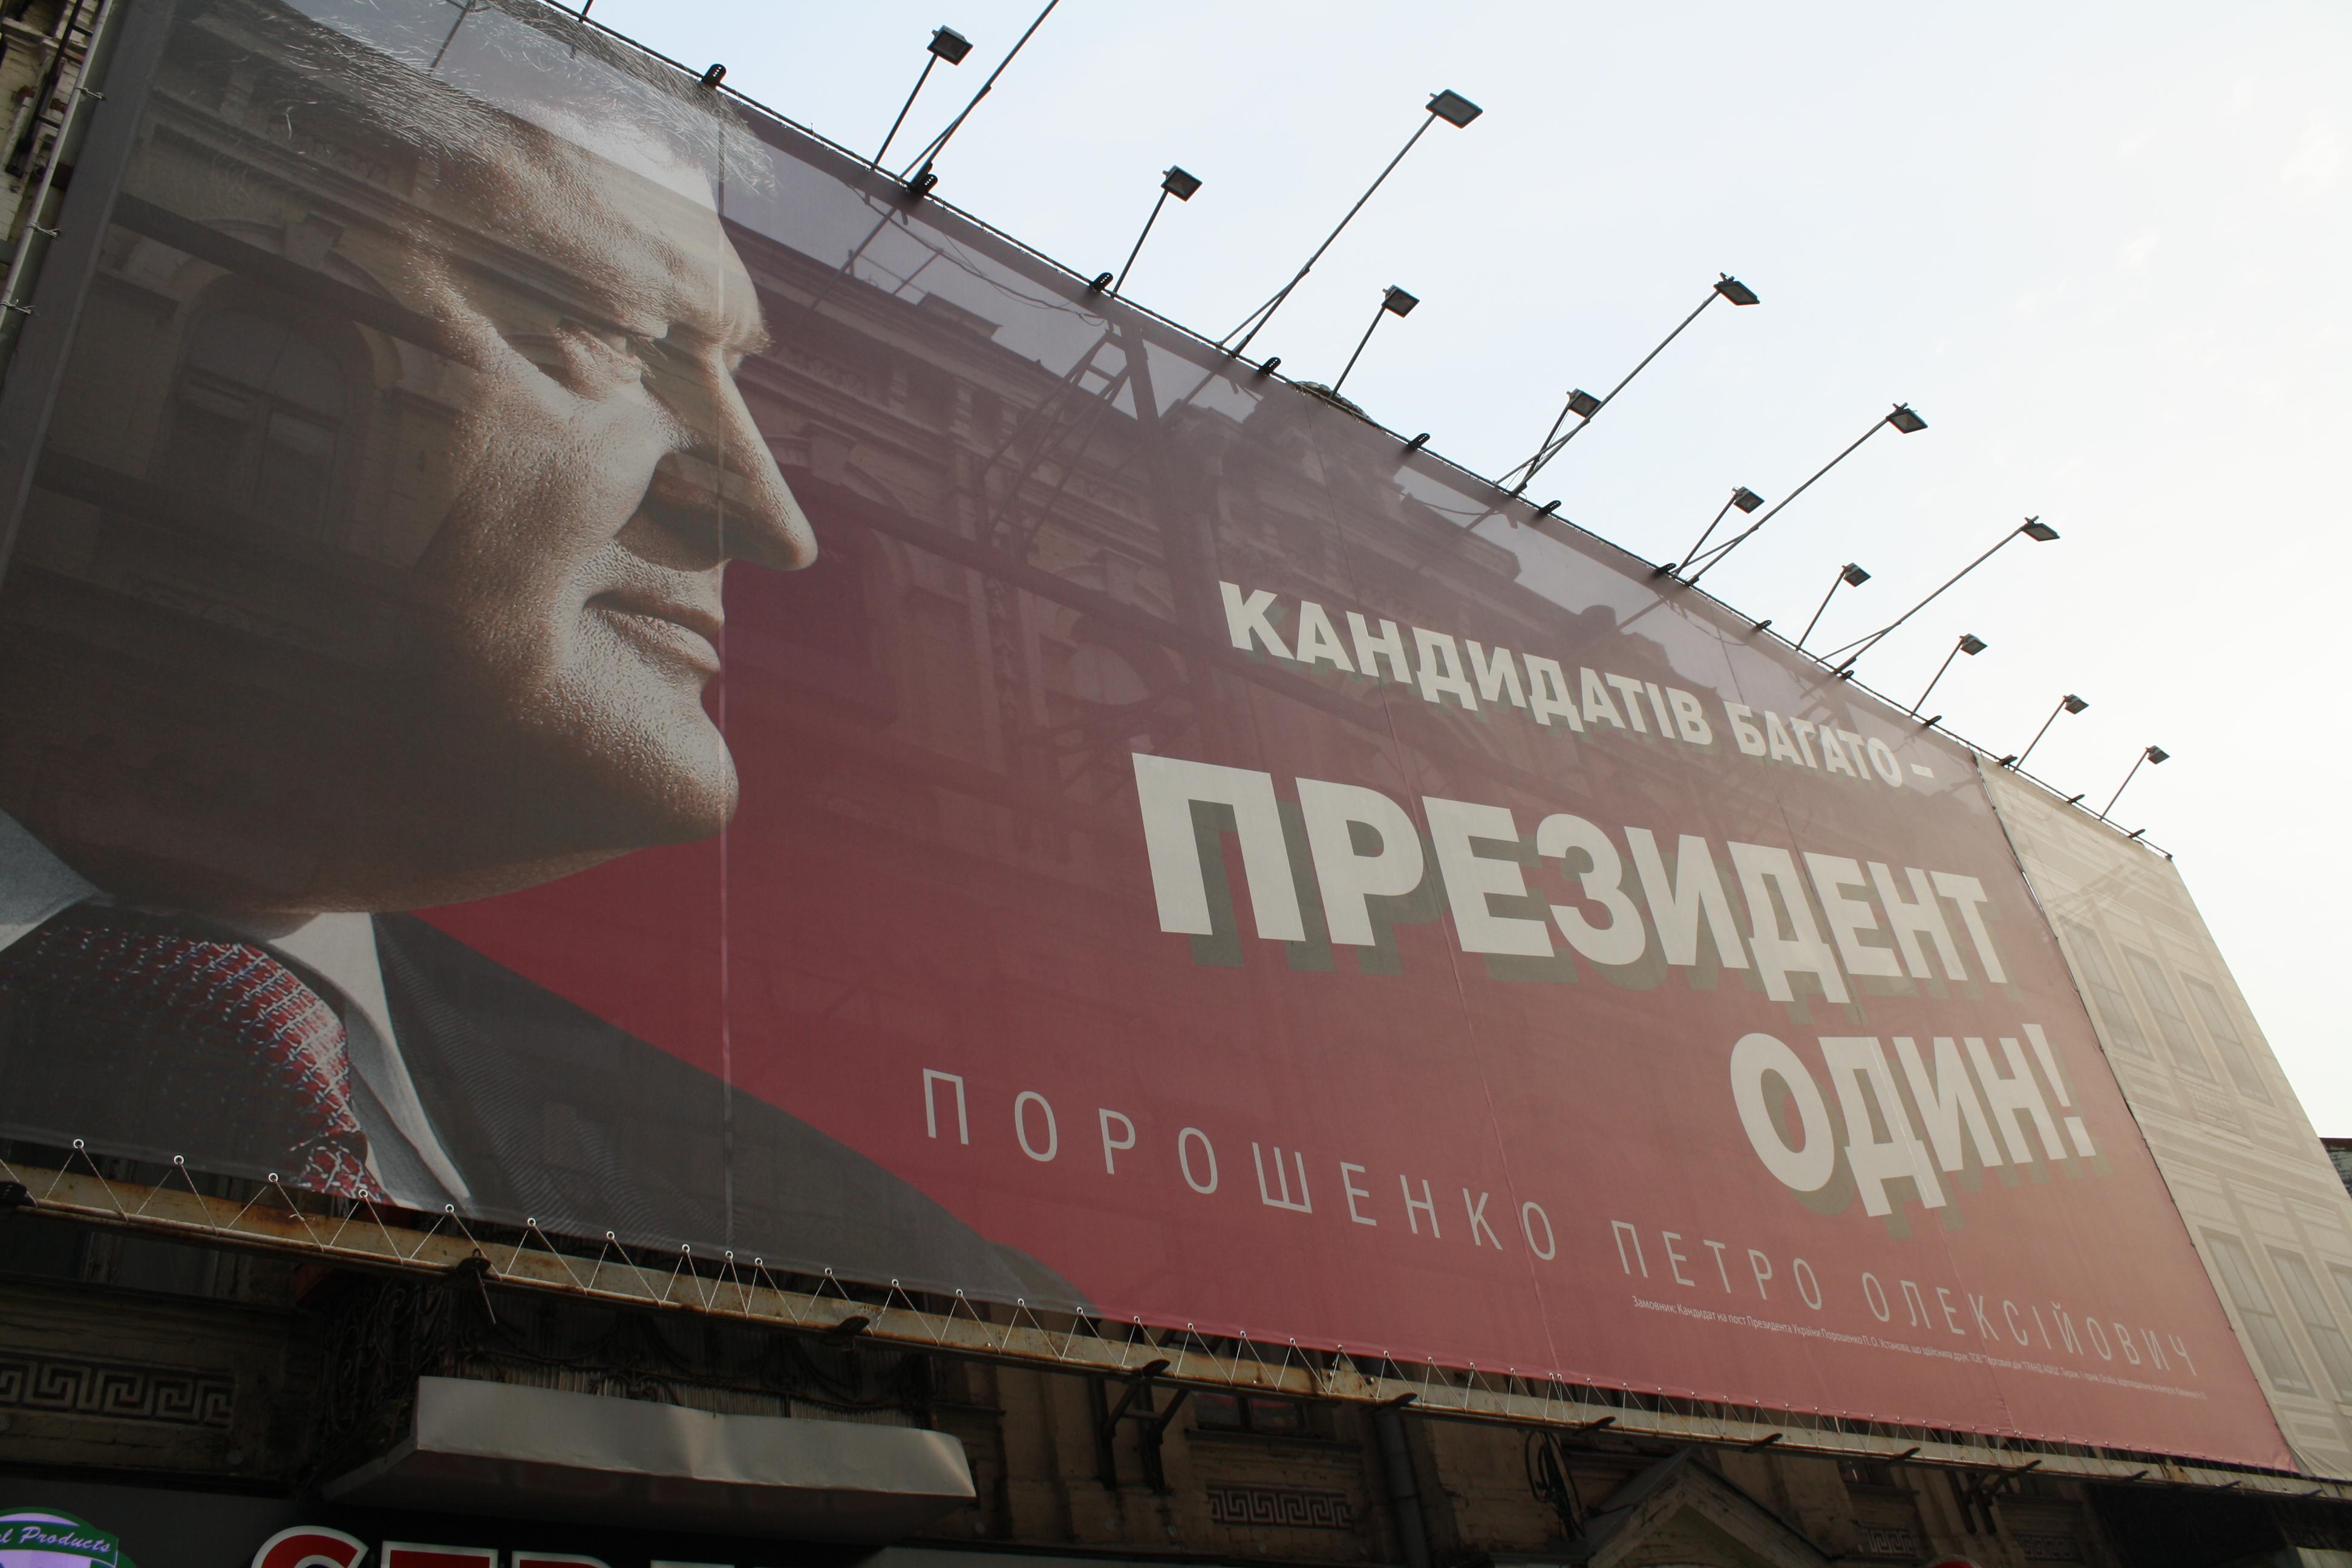 poster by Poroshenko's campaign